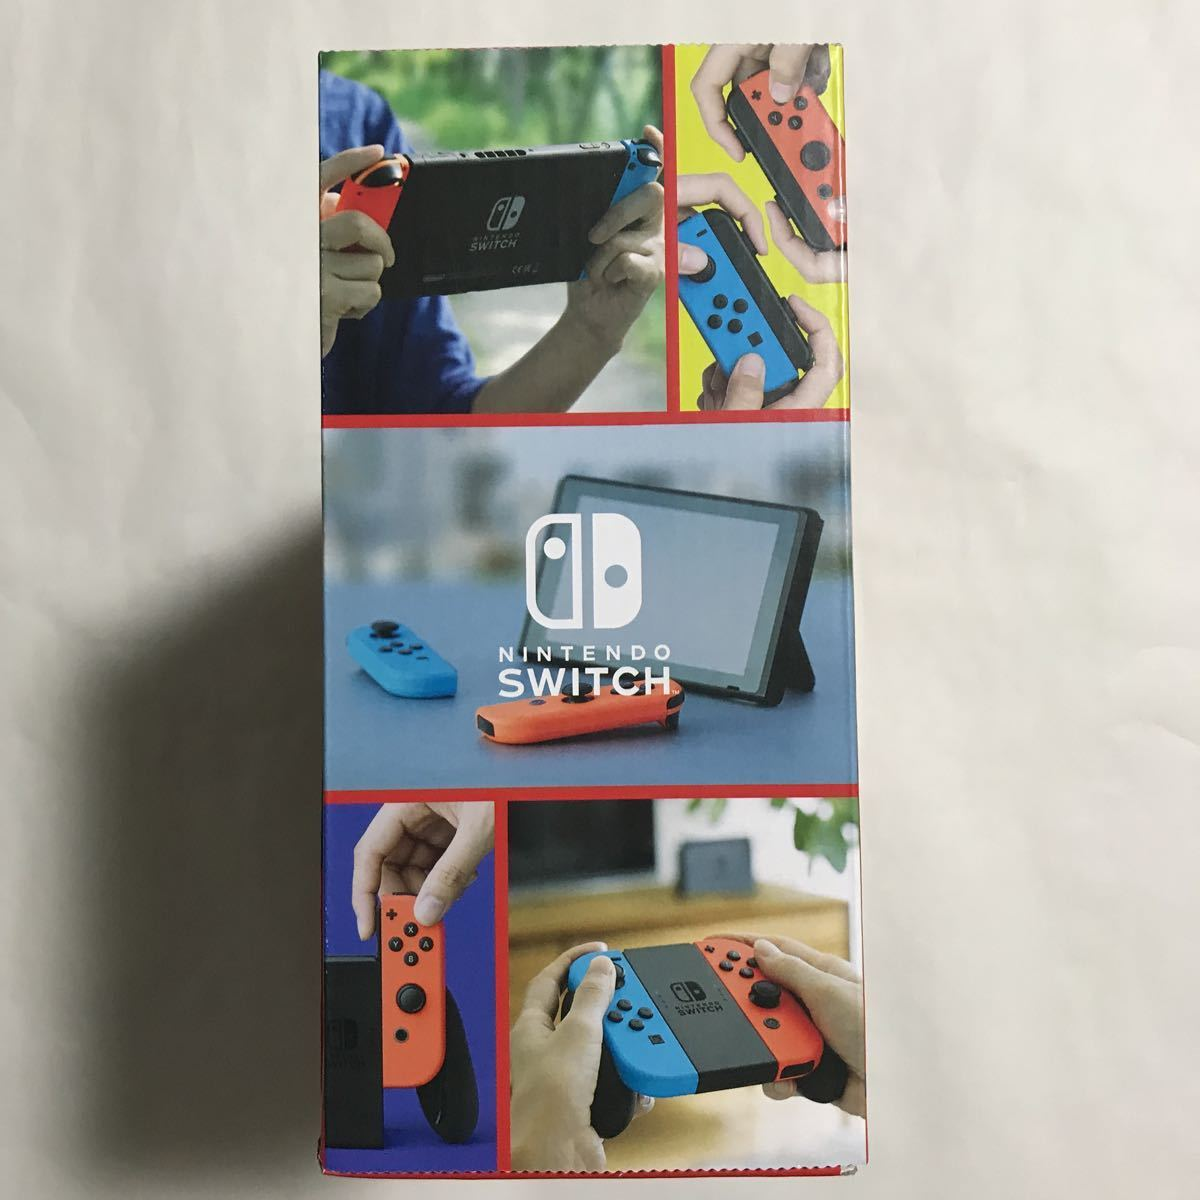 Nintendo Switch本体Joy-Con(L)ネオンブルー/(R)ネオンレッド新型 おまけ付 [新品未開封] 送料無料 ニンテンドースイッチ本体 任天堂 _画像7